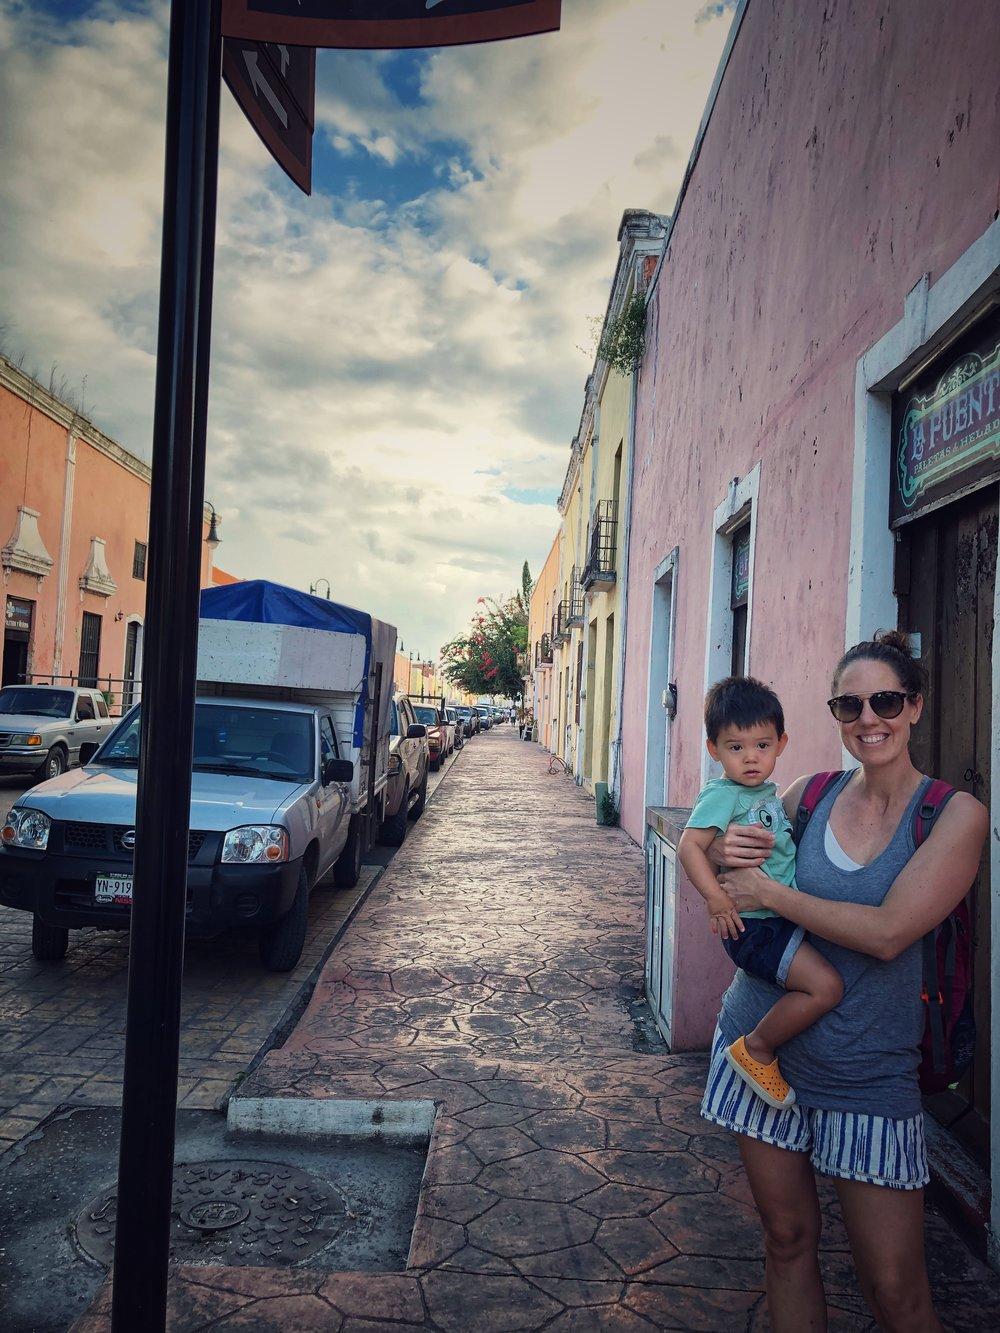 La Candelaria is a really lovely neighborhood.